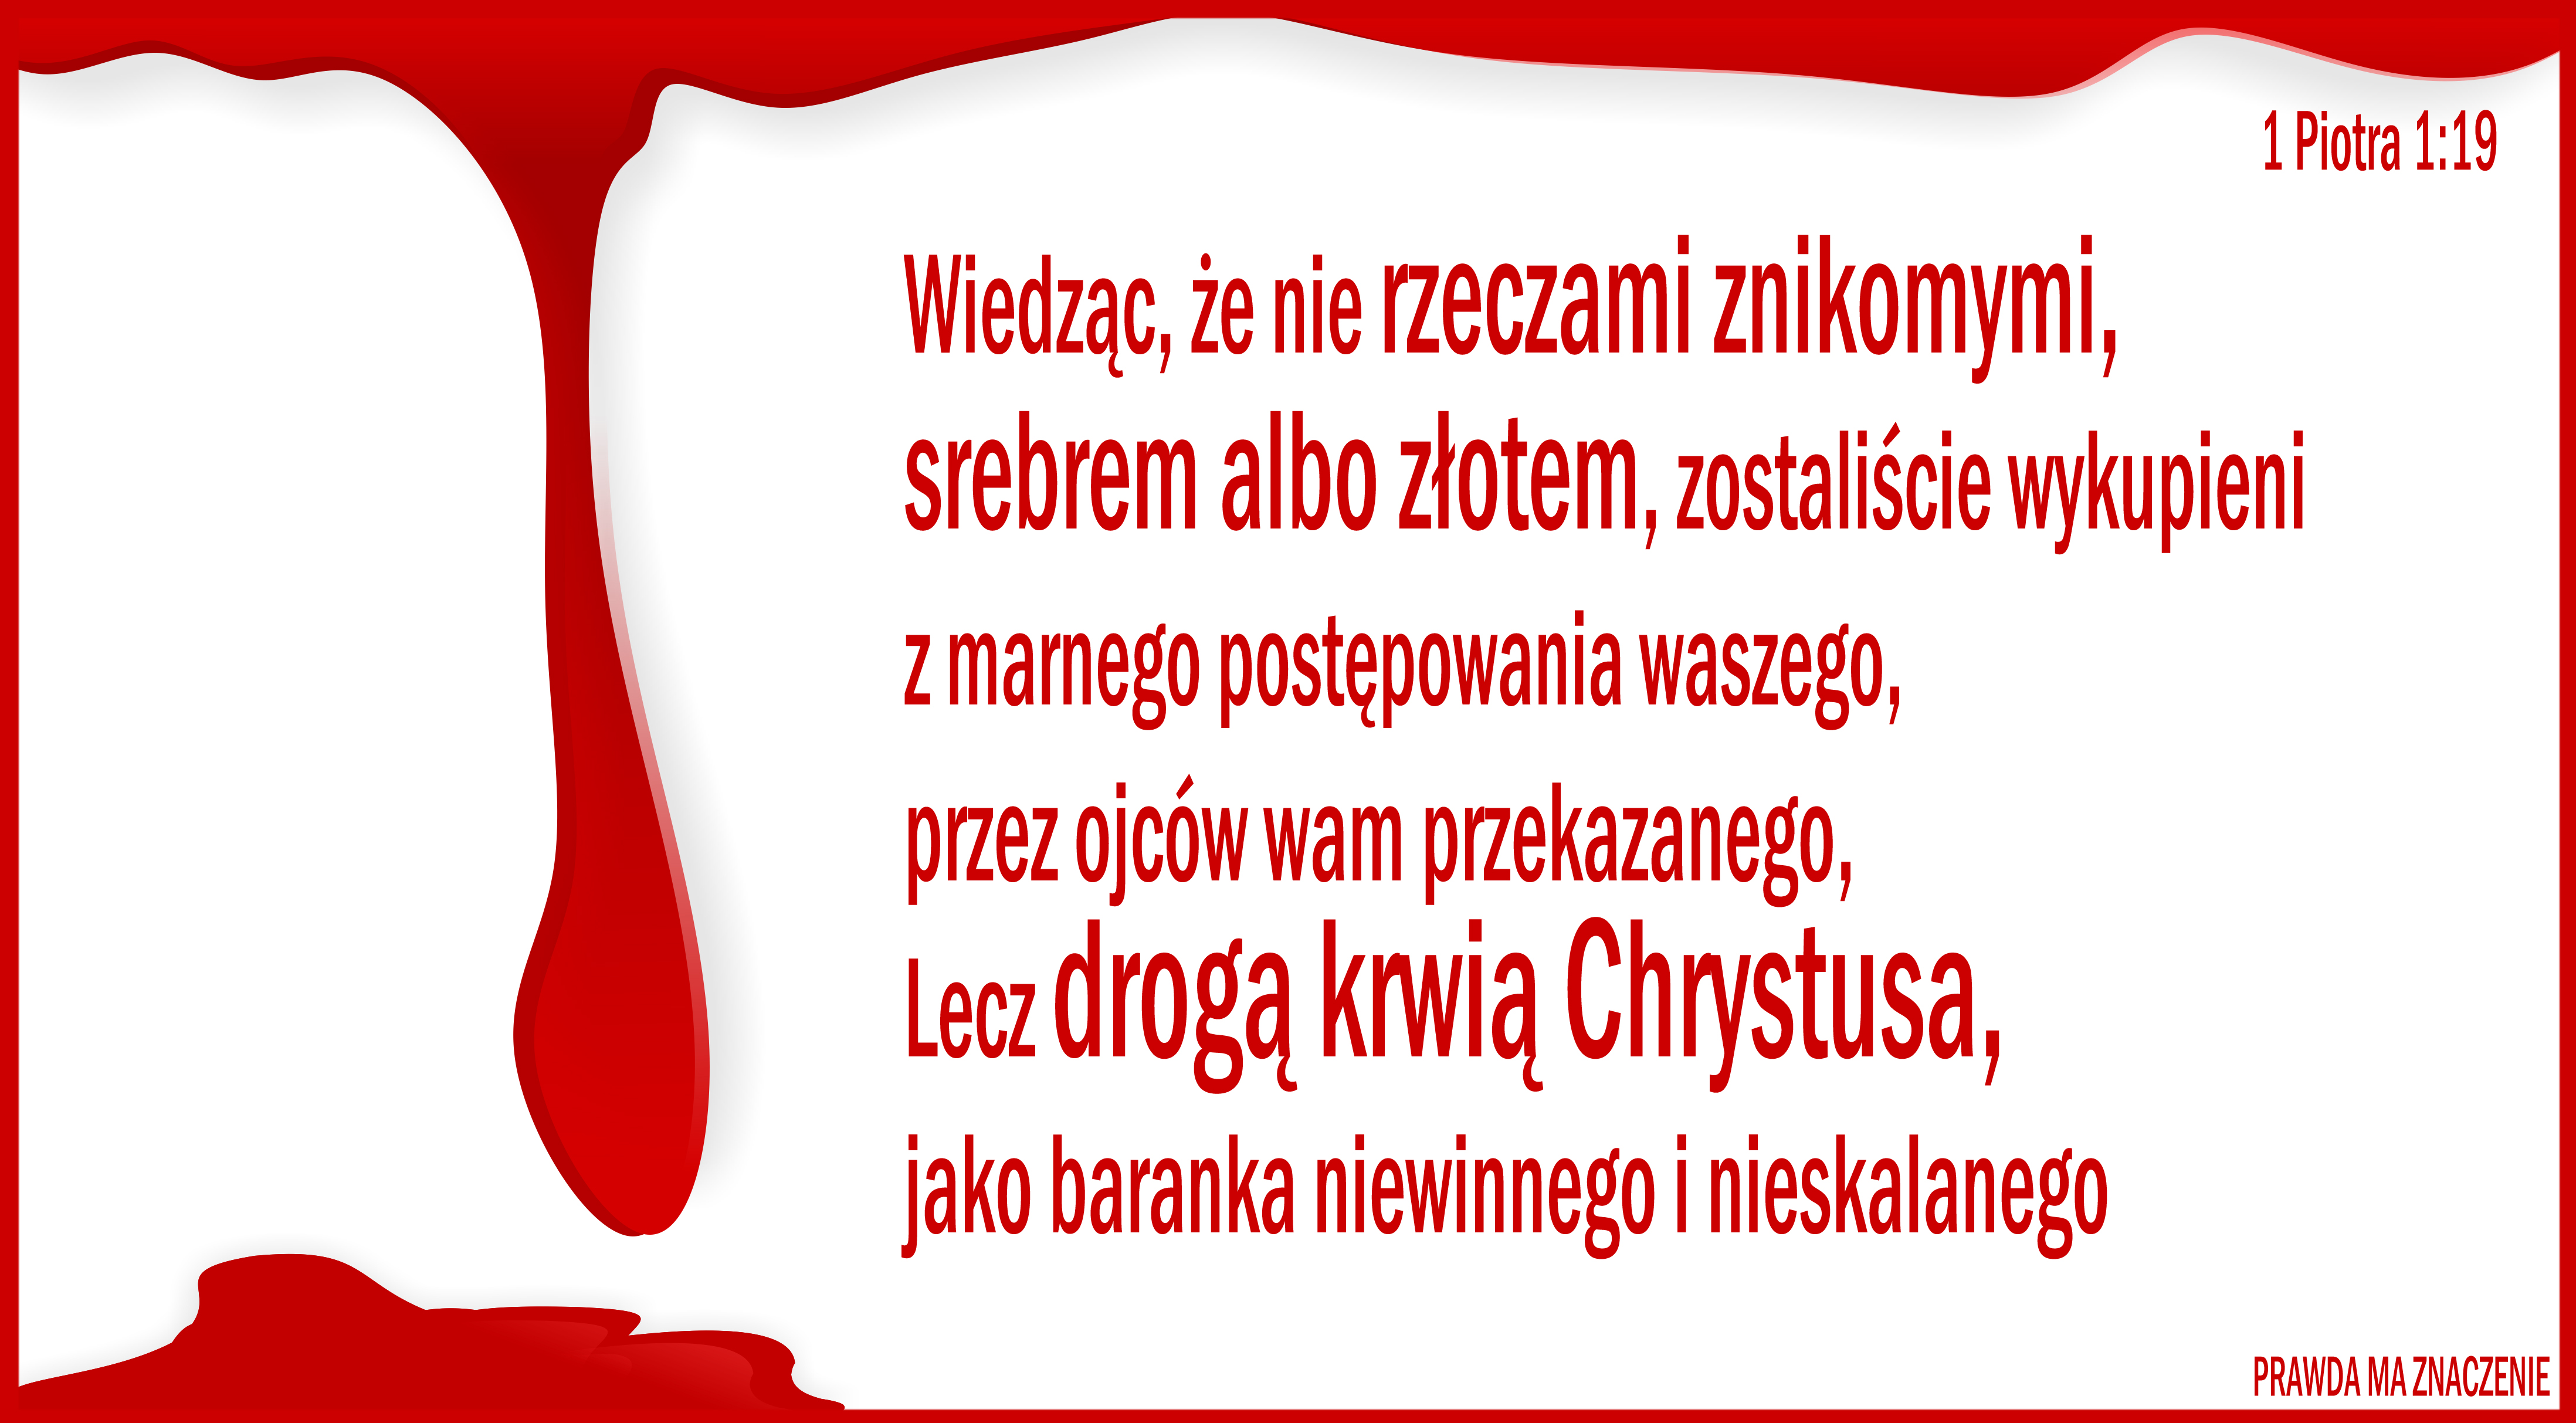 1 Piotra 1 19 2